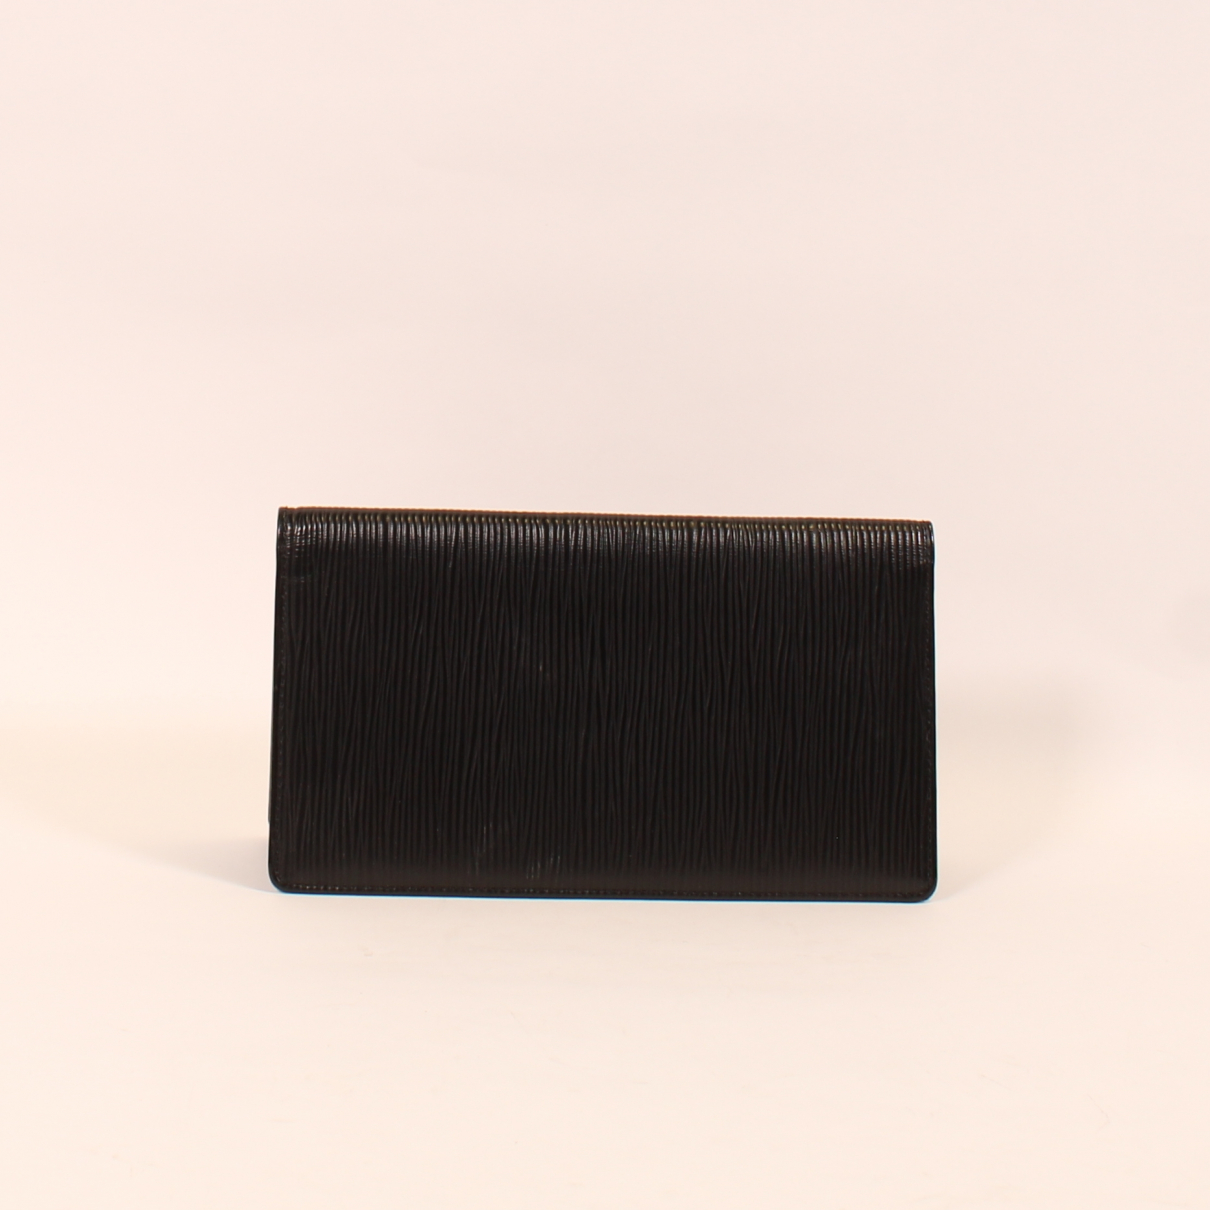 Louis Vuitton N Black Leather Jewellery for Men N